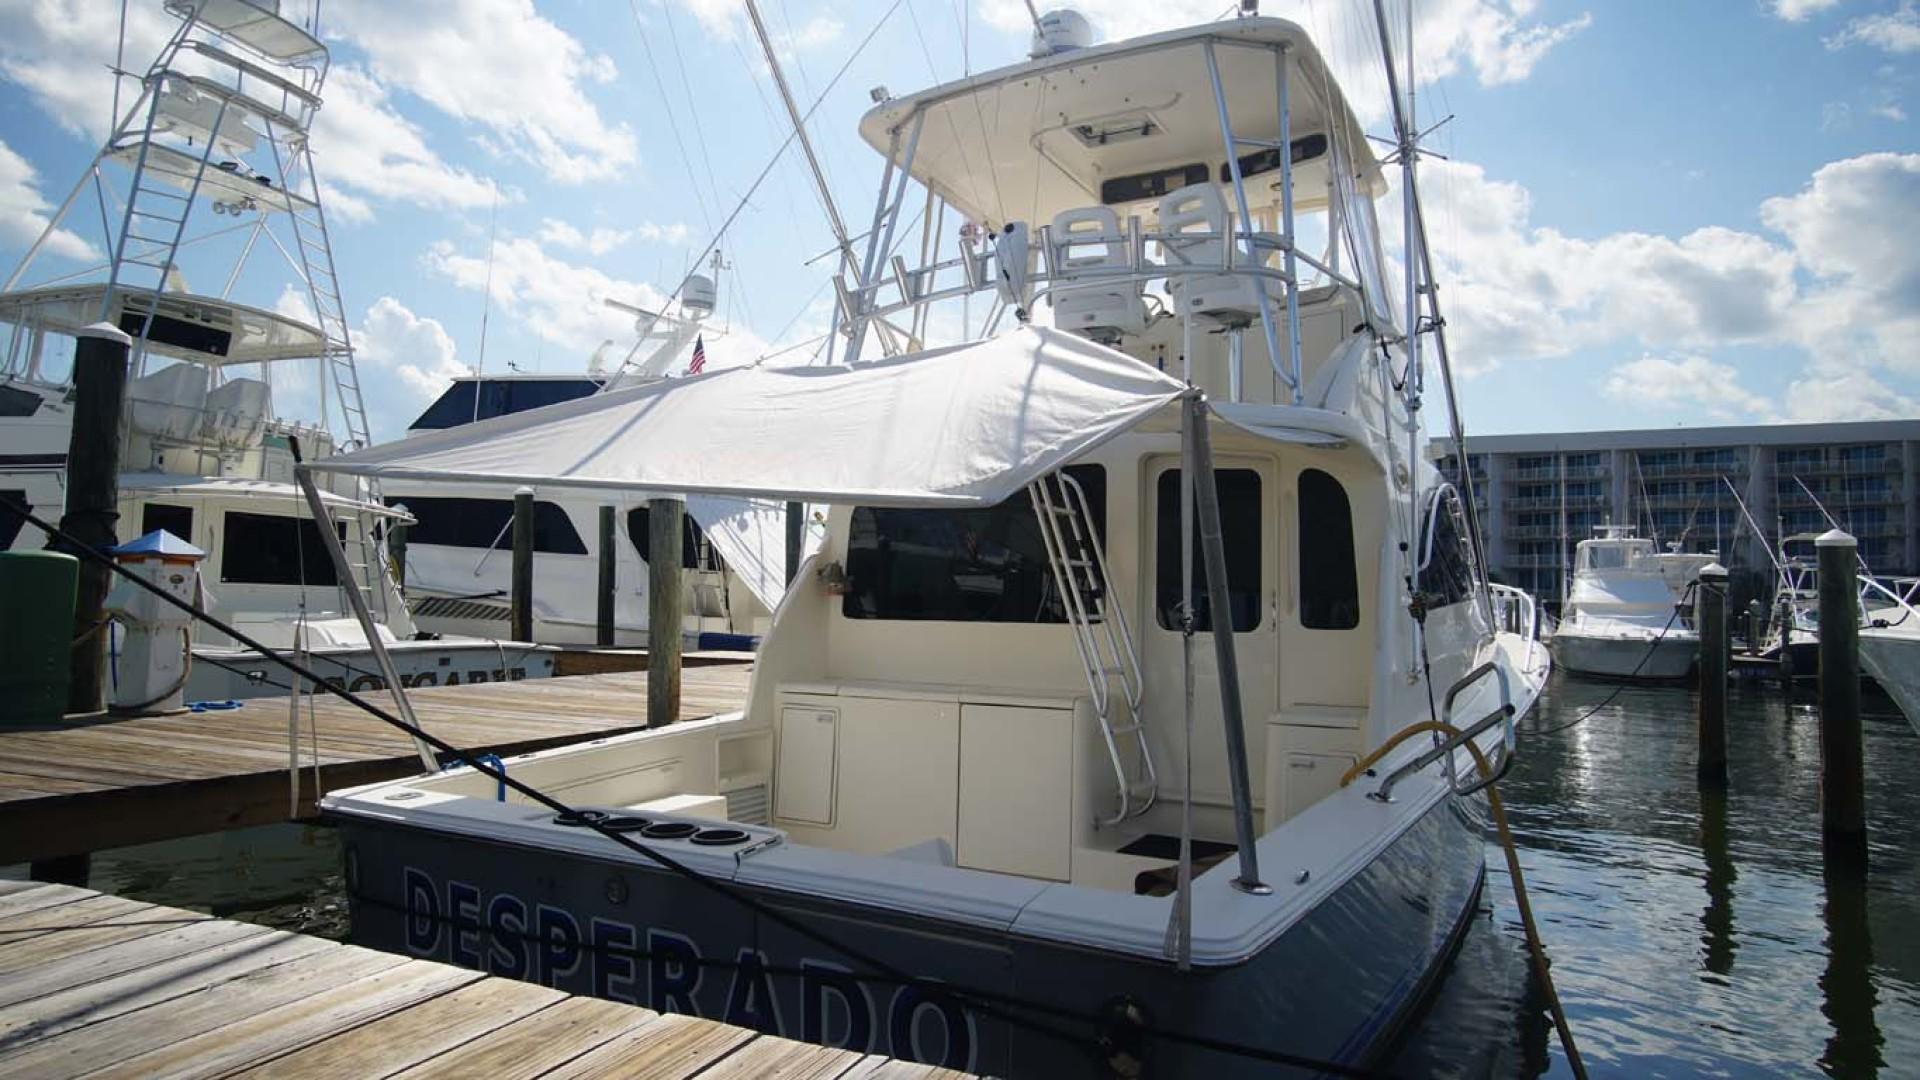 Ocean Yachts-43 Super Sport 2002-Desperado Orange Beach-Alabama-United States-Cockpit Shade-1219876 | Thumbnail